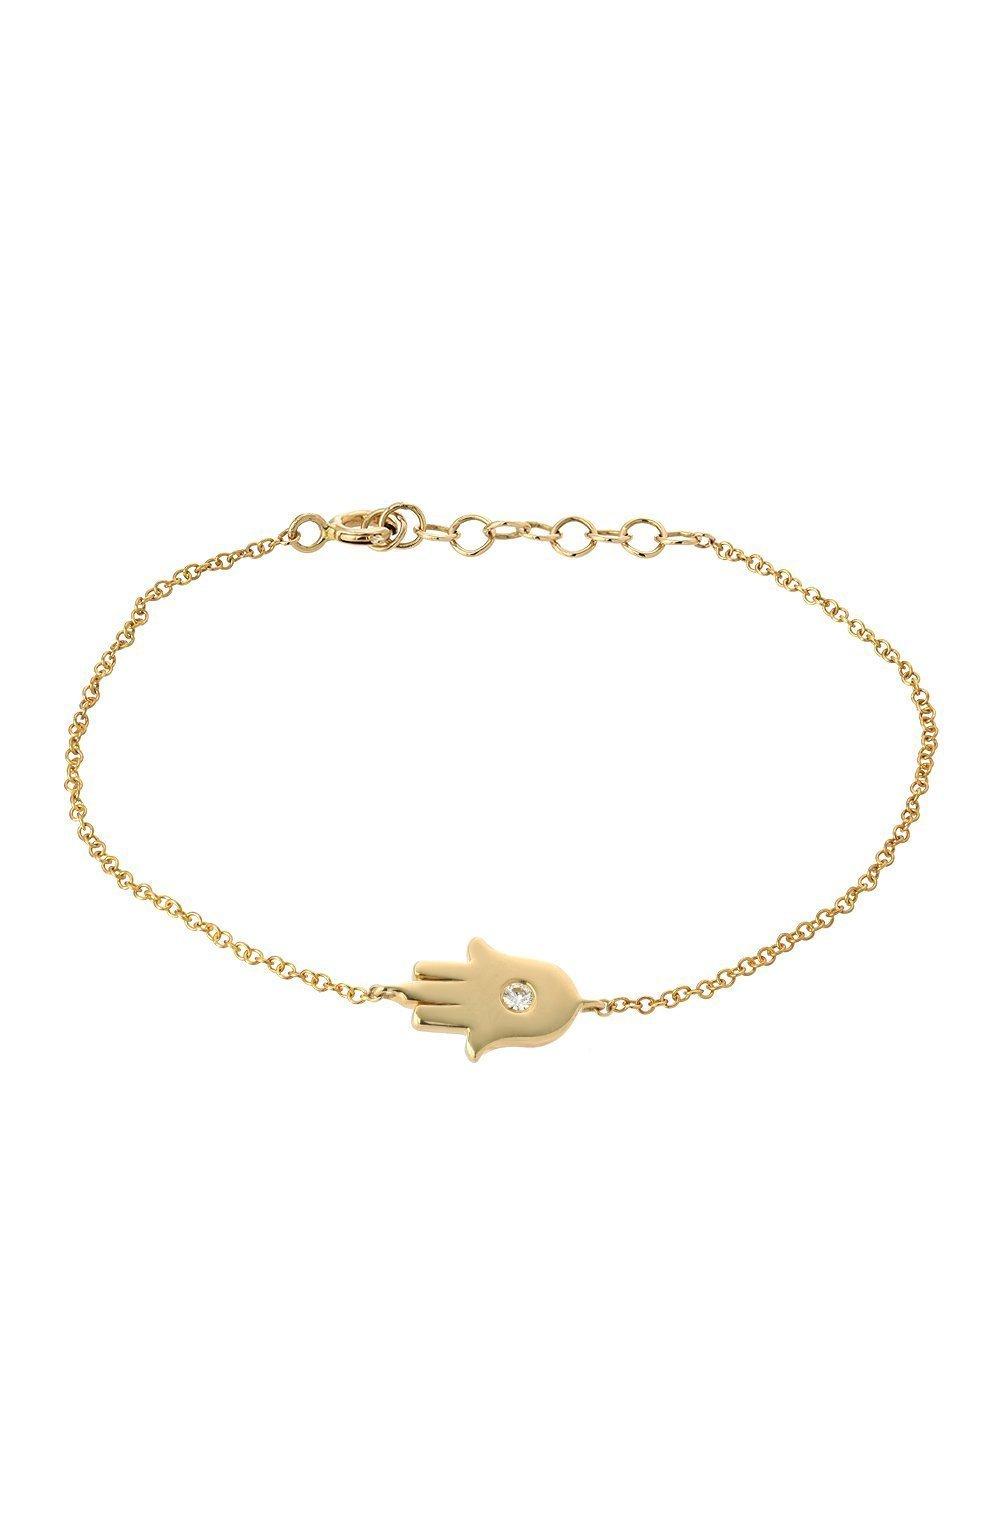 14k gold hamsa bracelet with diamond, single diamond hamsa